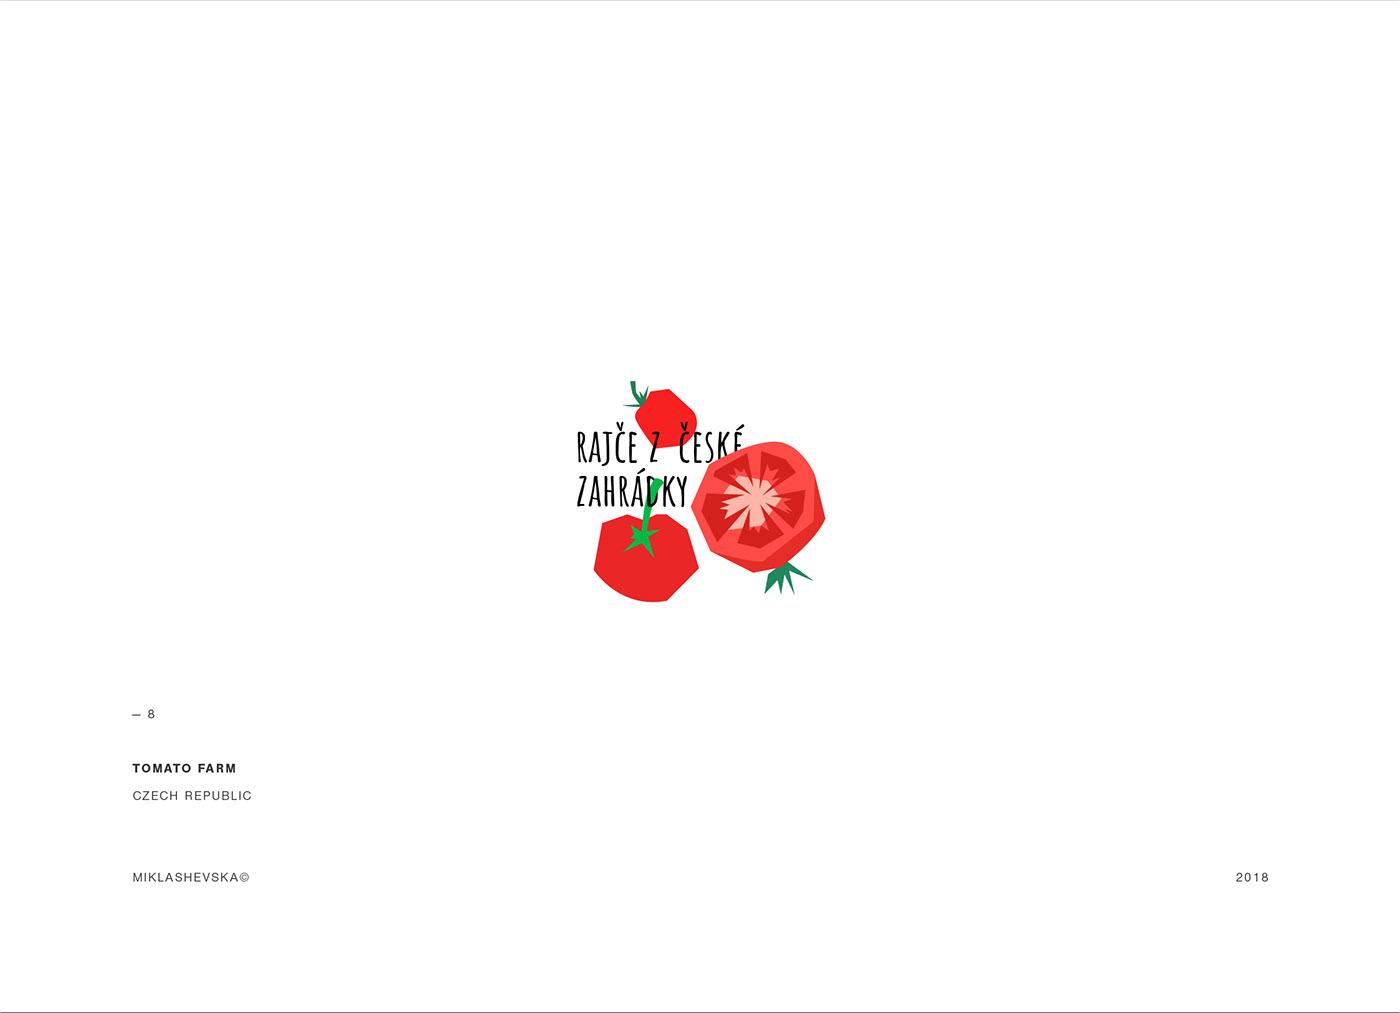 brand branding  Collection logo logofolio Logotype symbol visualidentity